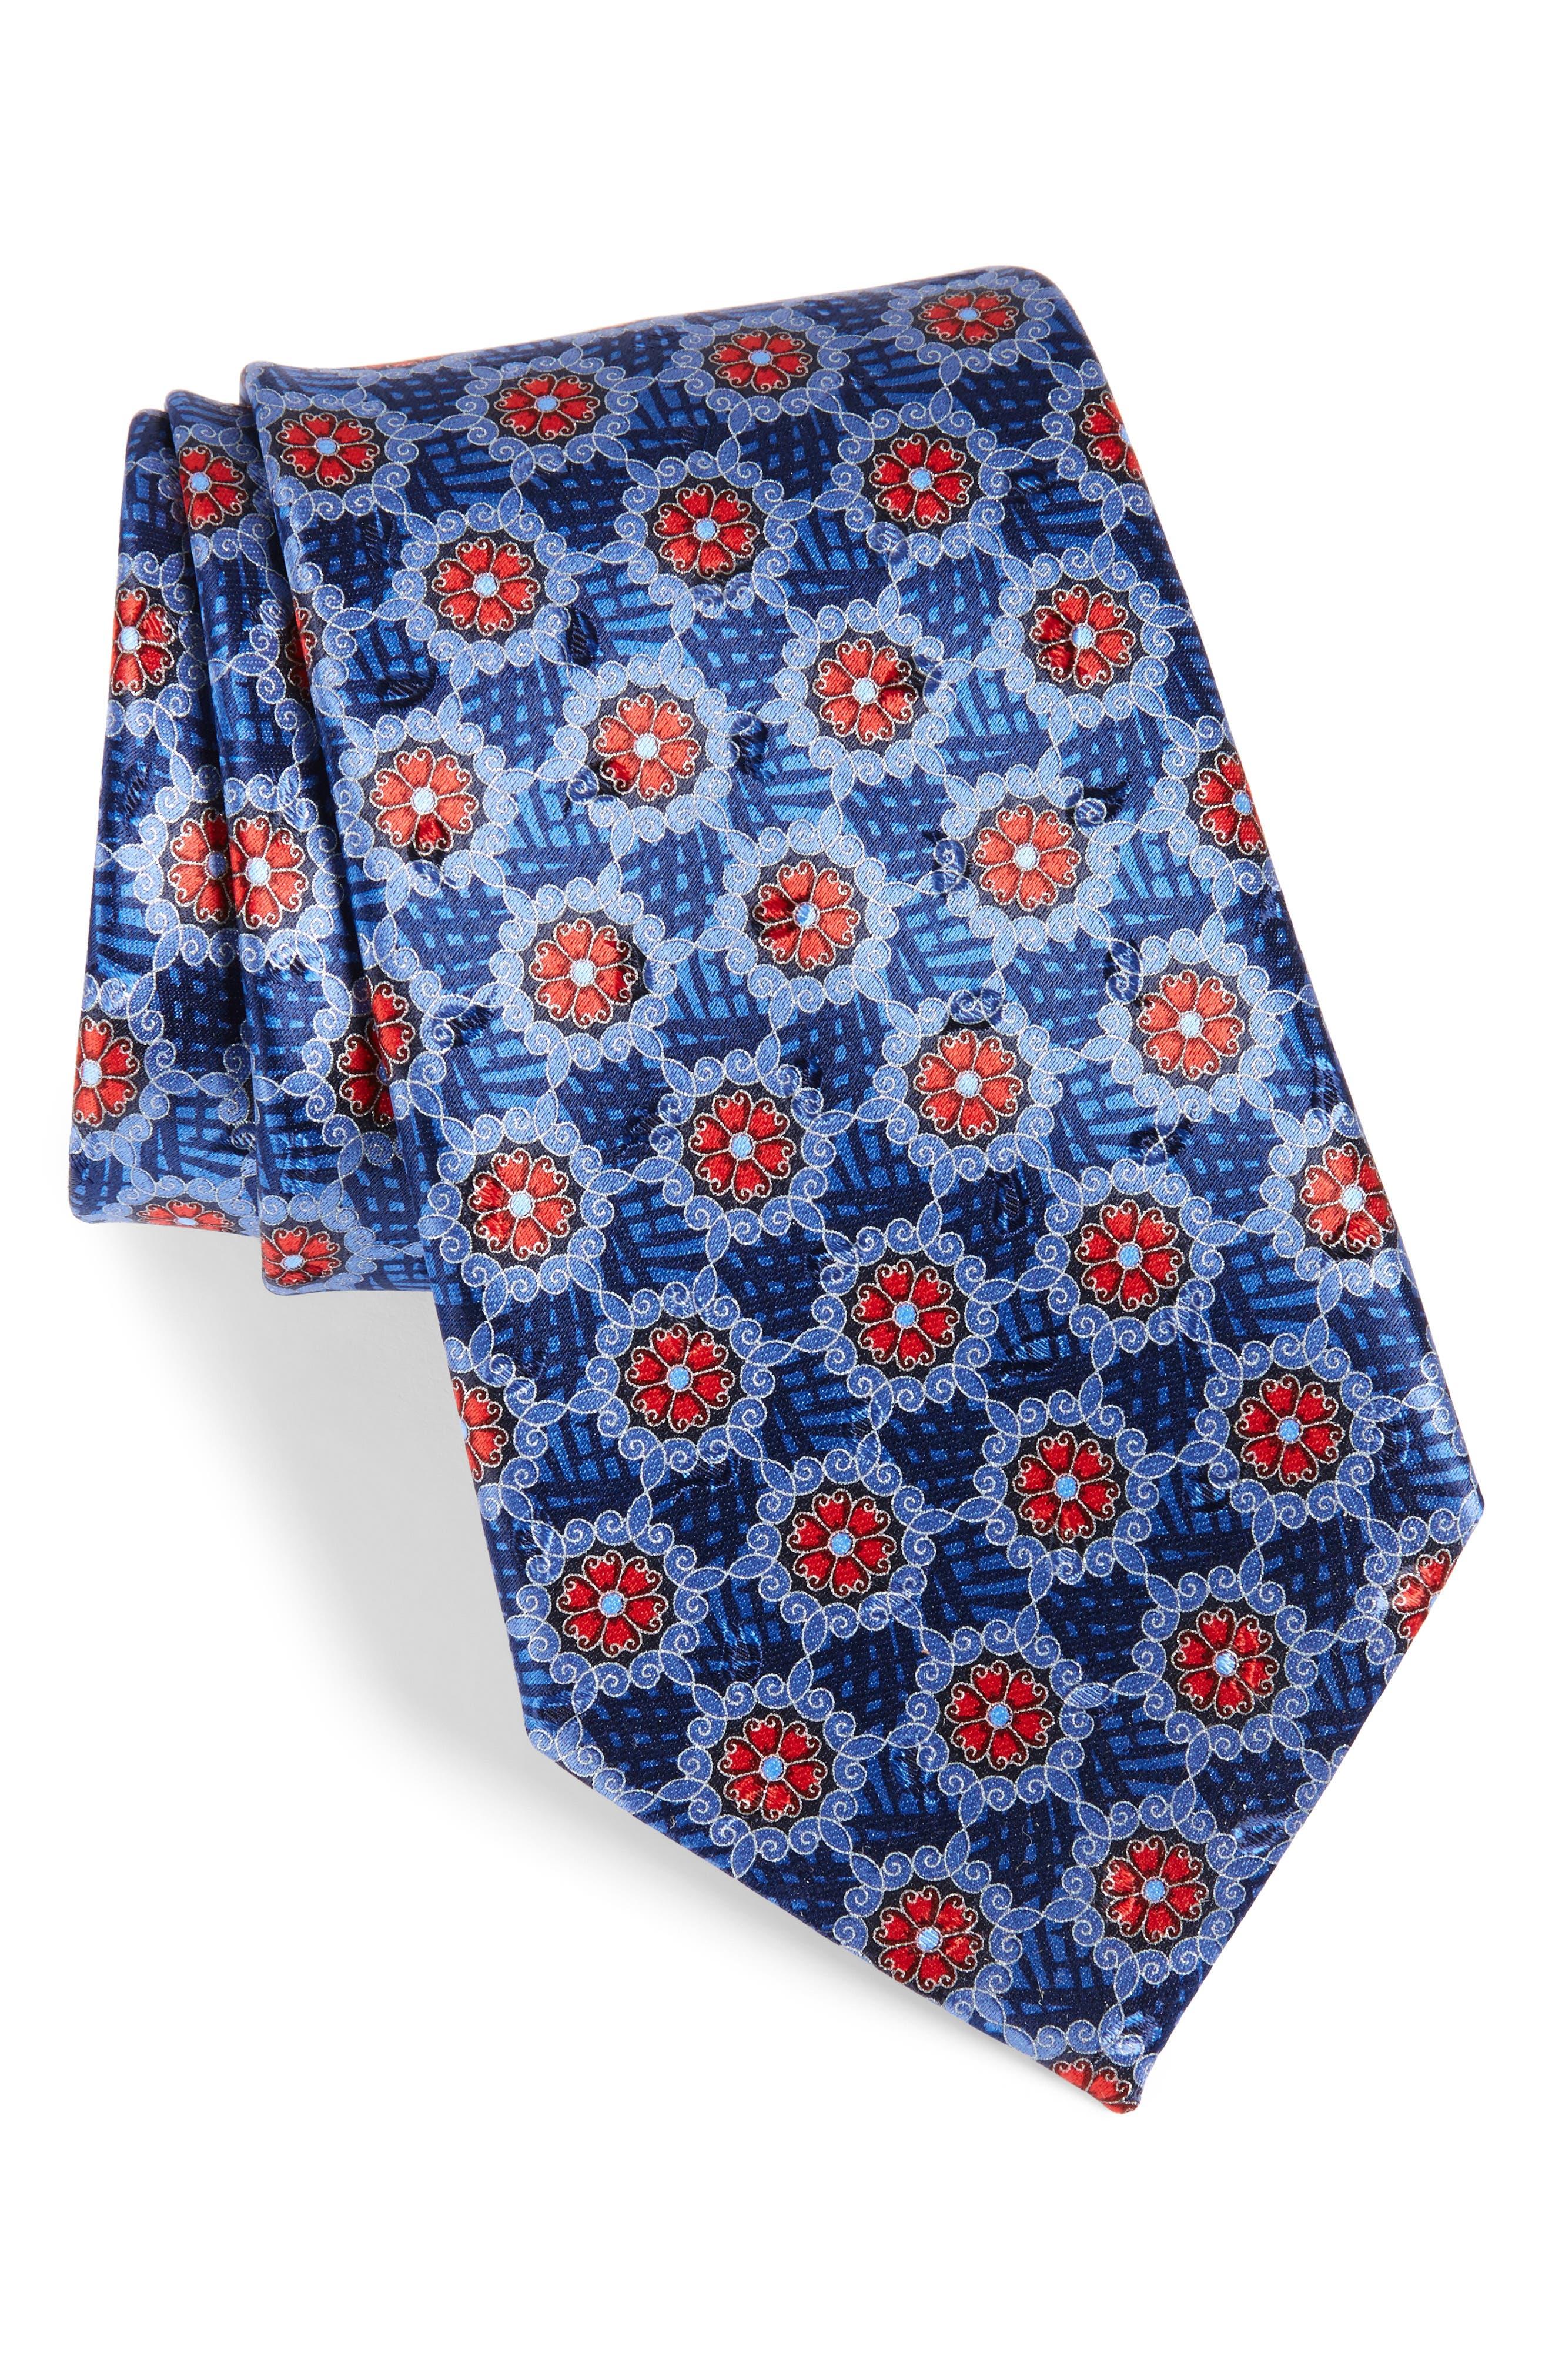 Alternate Image 1 Selected - Ermenegildo Zegna Medallion Silk Tie